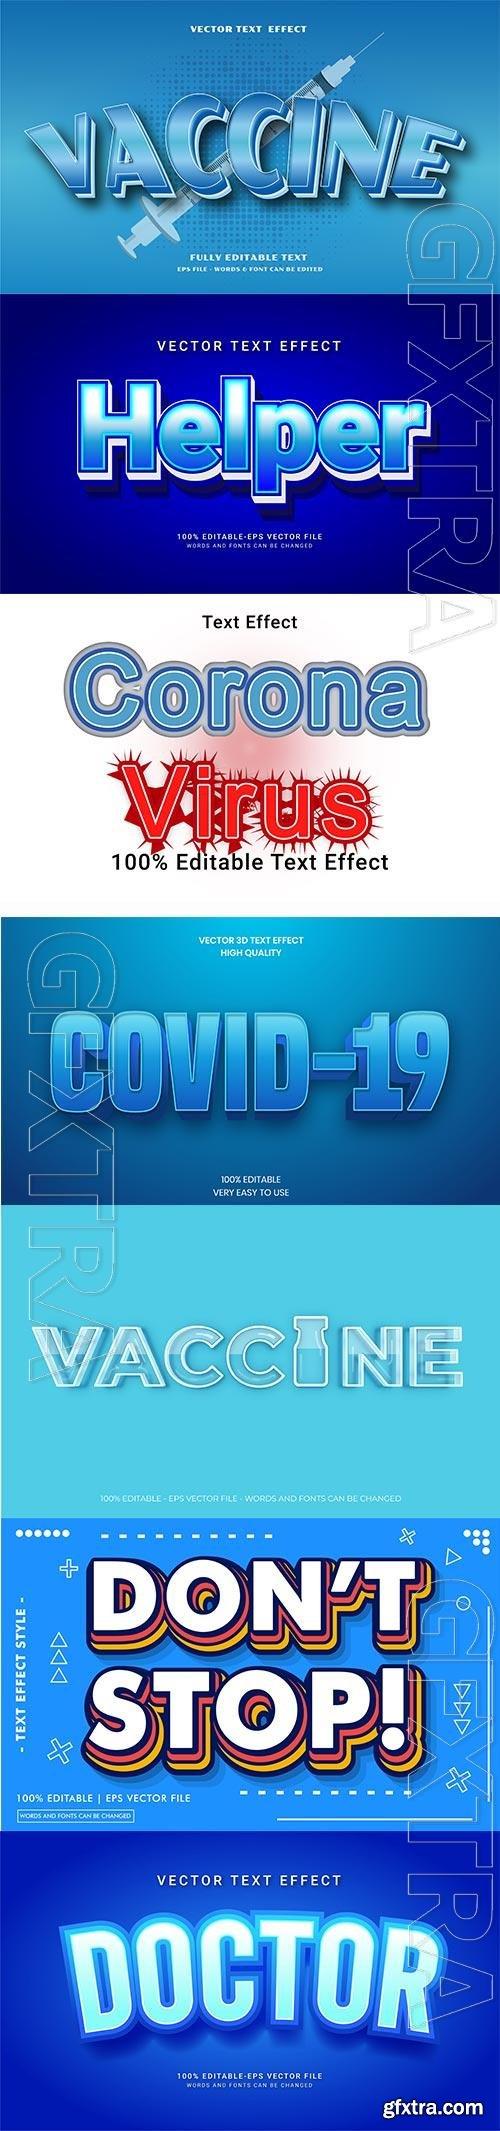 Coronavirus COVID-19, vaccine text style effect vector vol 191